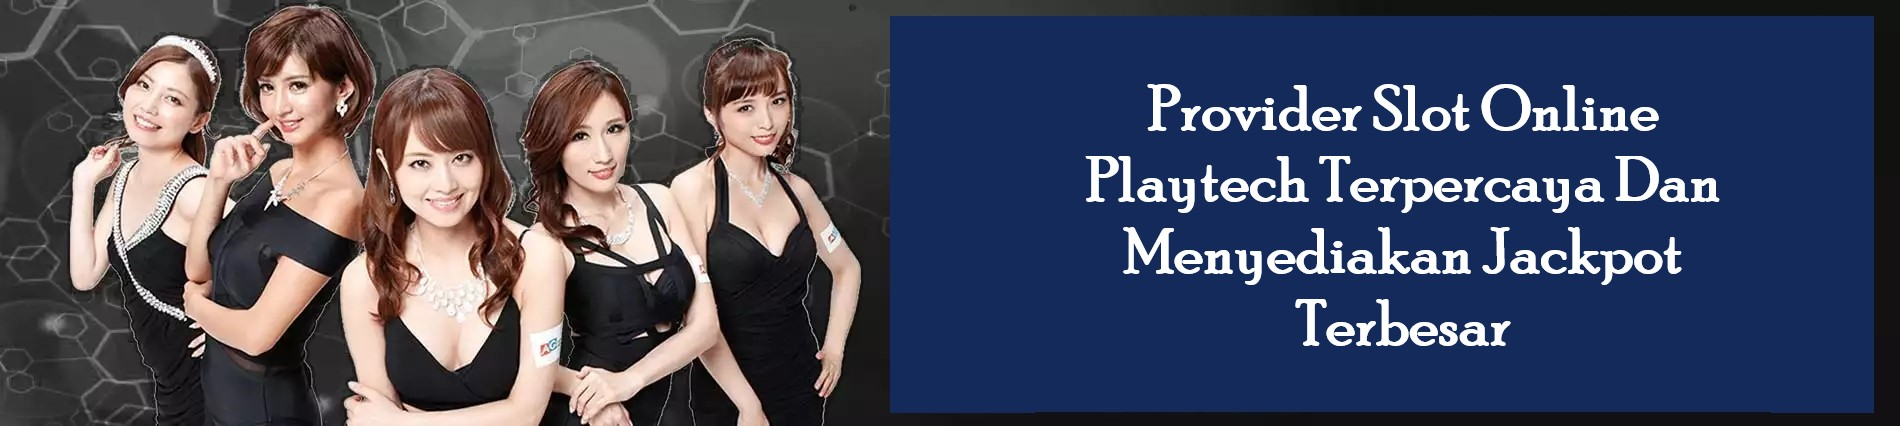 Provider Slot Online Playtech Terpercaya Dan Menyediakan Jackpot Terbesar